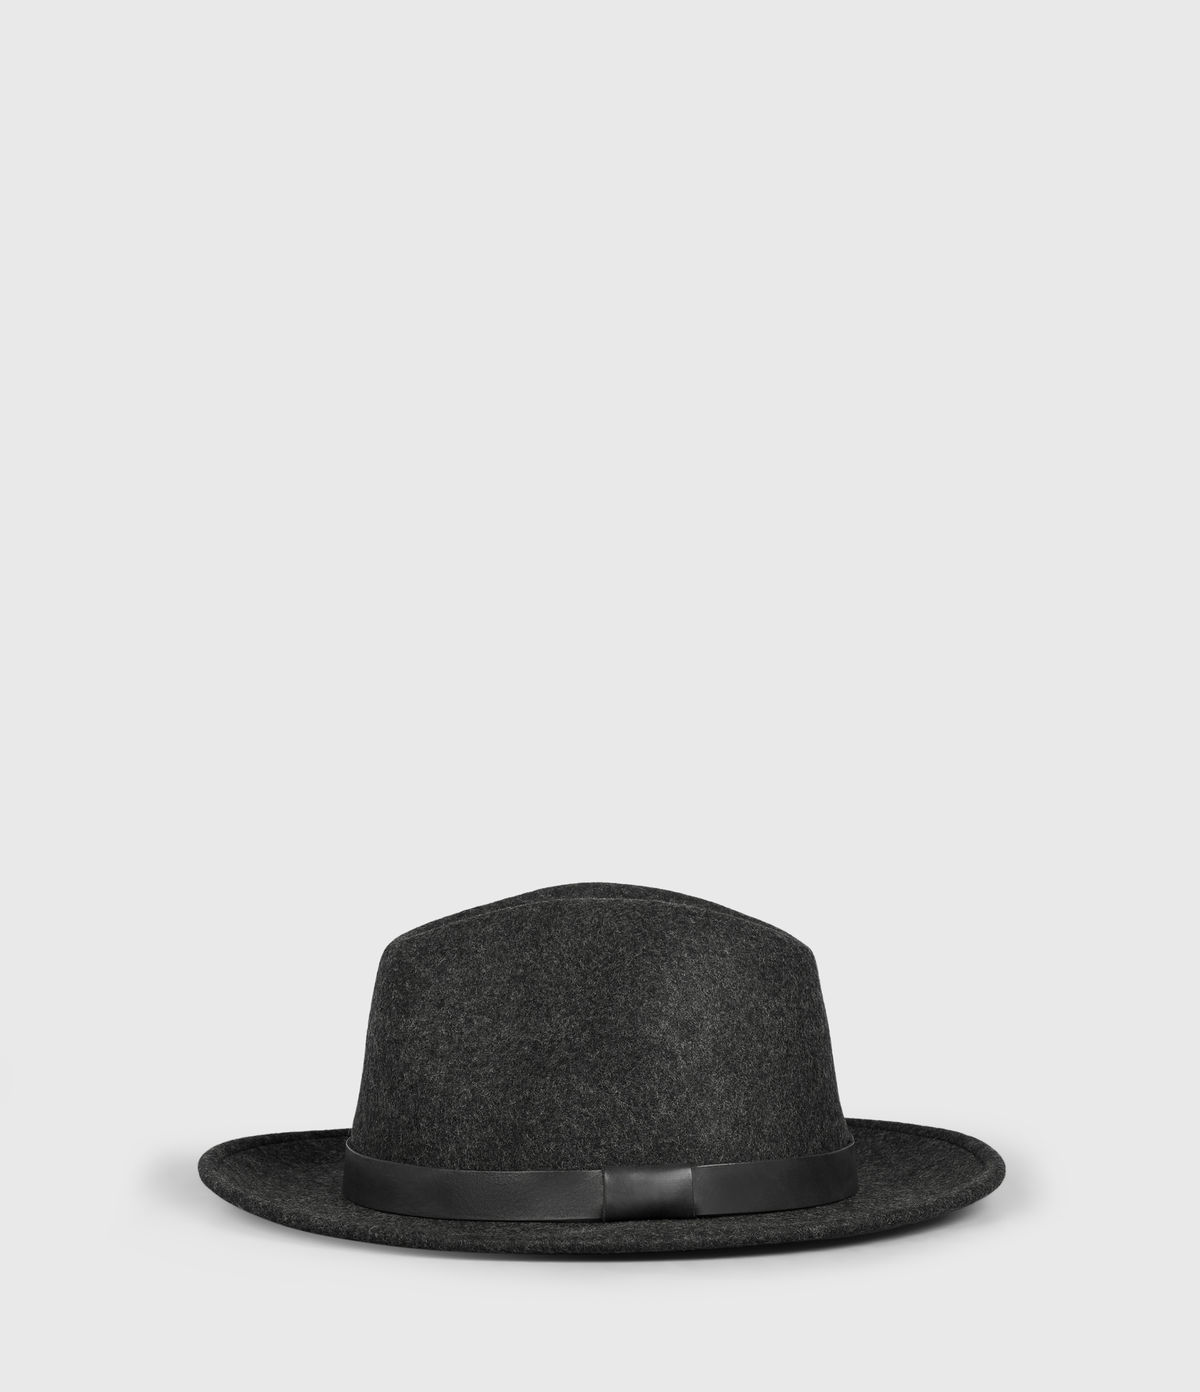 bronson-leather-fedora-hat